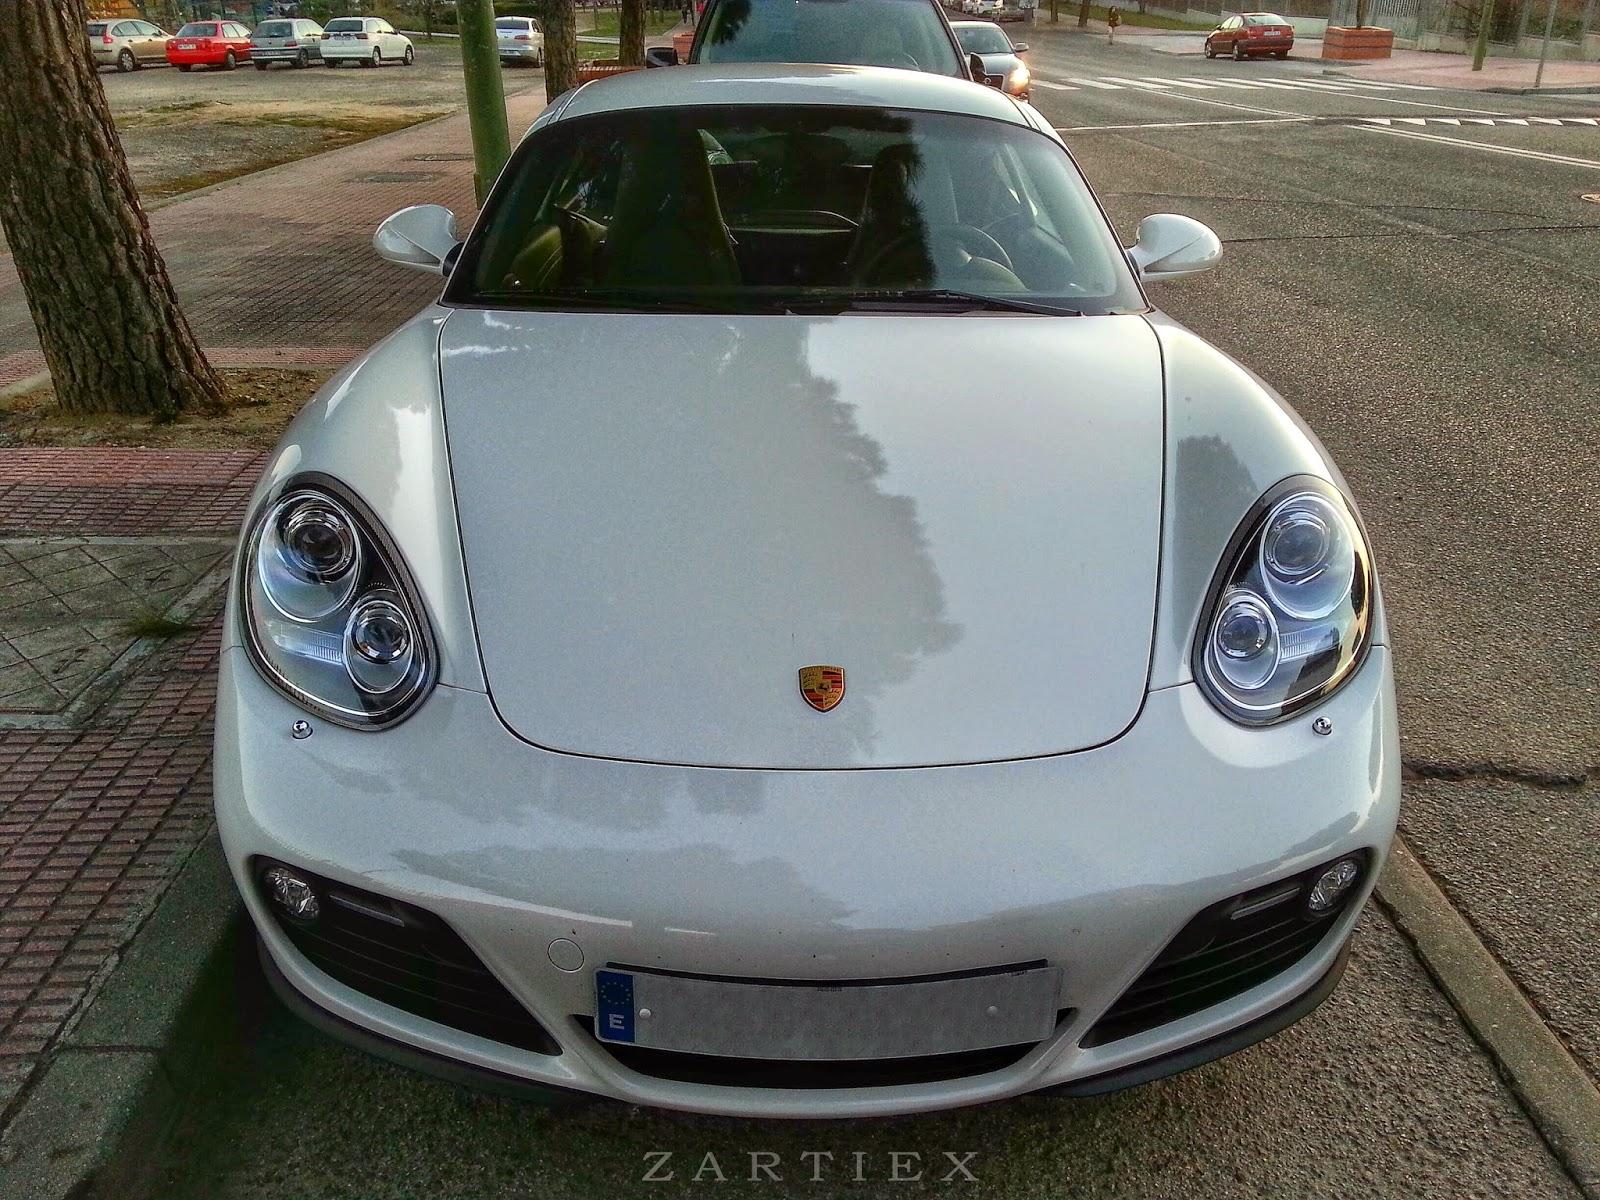 Porsche Carrera, Porsche Carrera S.